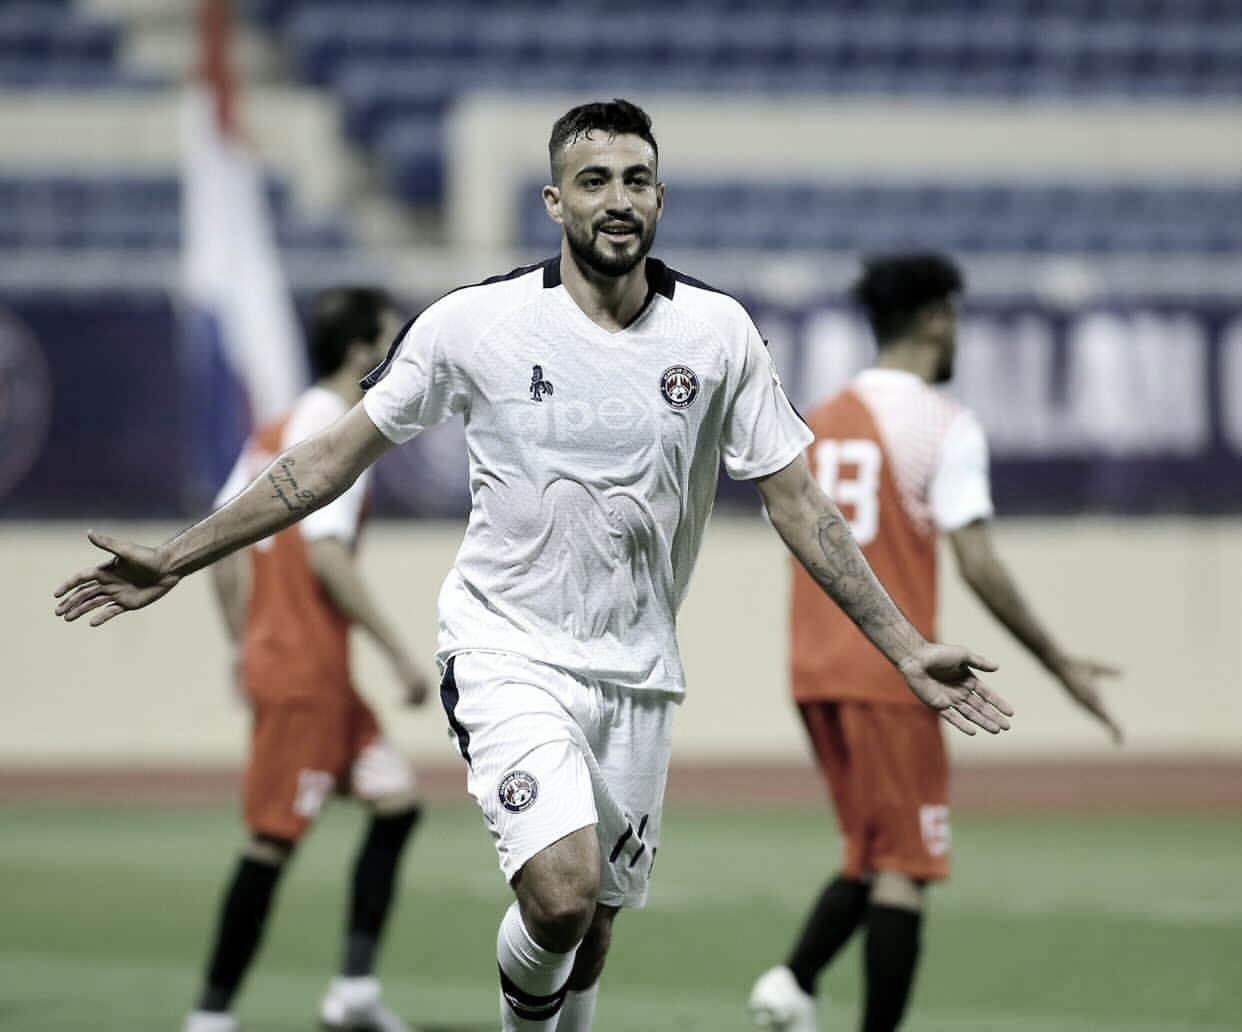 Everton destaca boa fase no Al Adalah e projeta meta de gols no fim da temporada